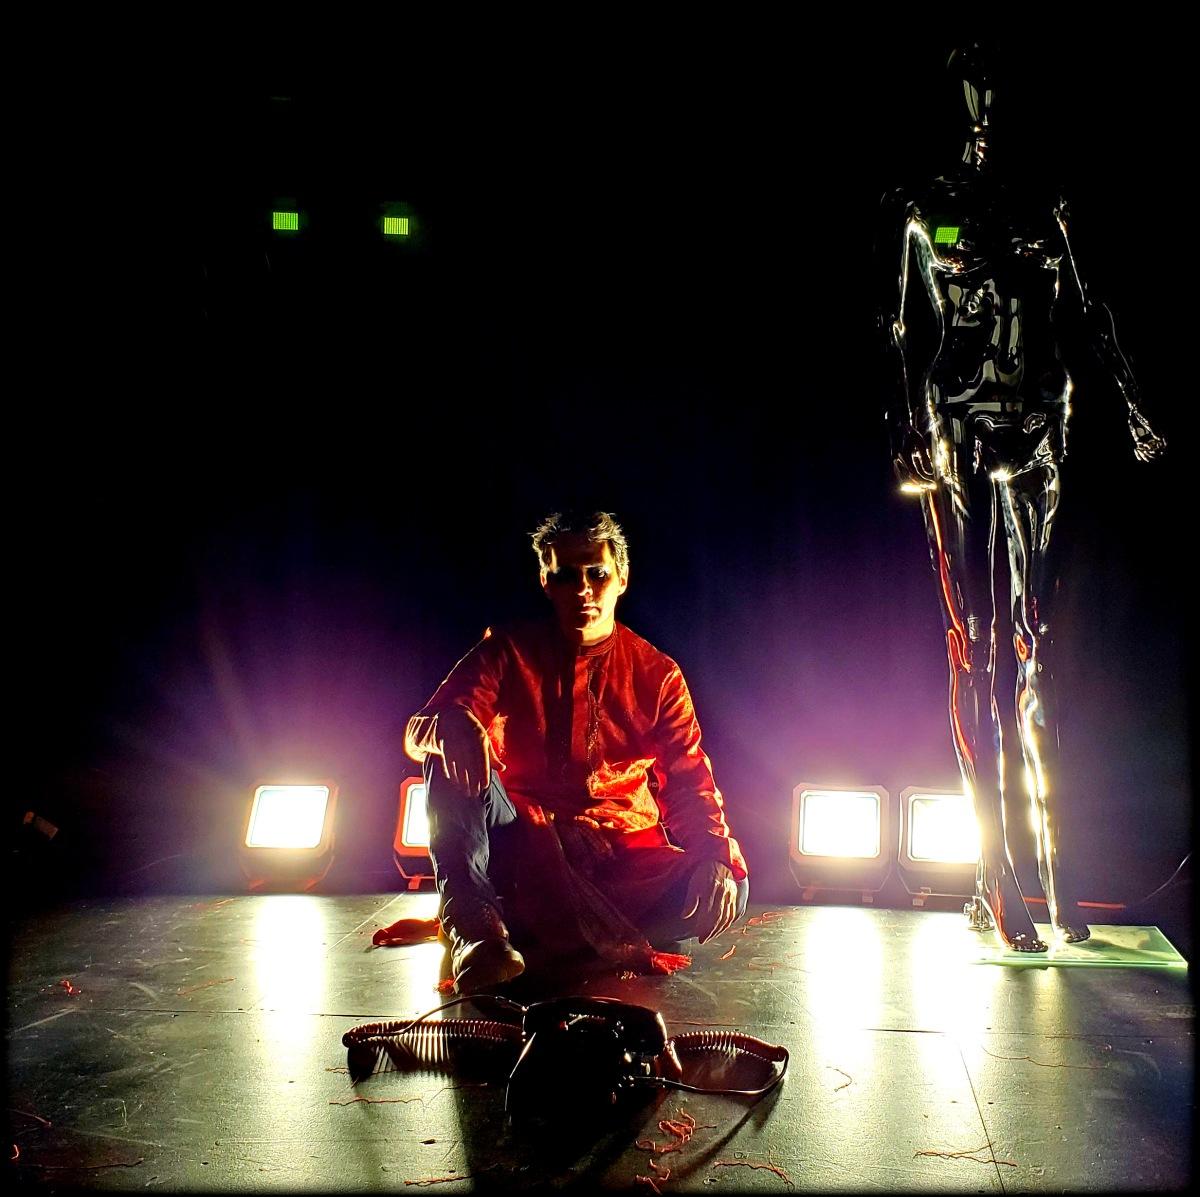 STOCKHAUSEN & THE AMPLIFIED RIOT liberan su video 'Animal Night Train' adelanto de su Epdebut